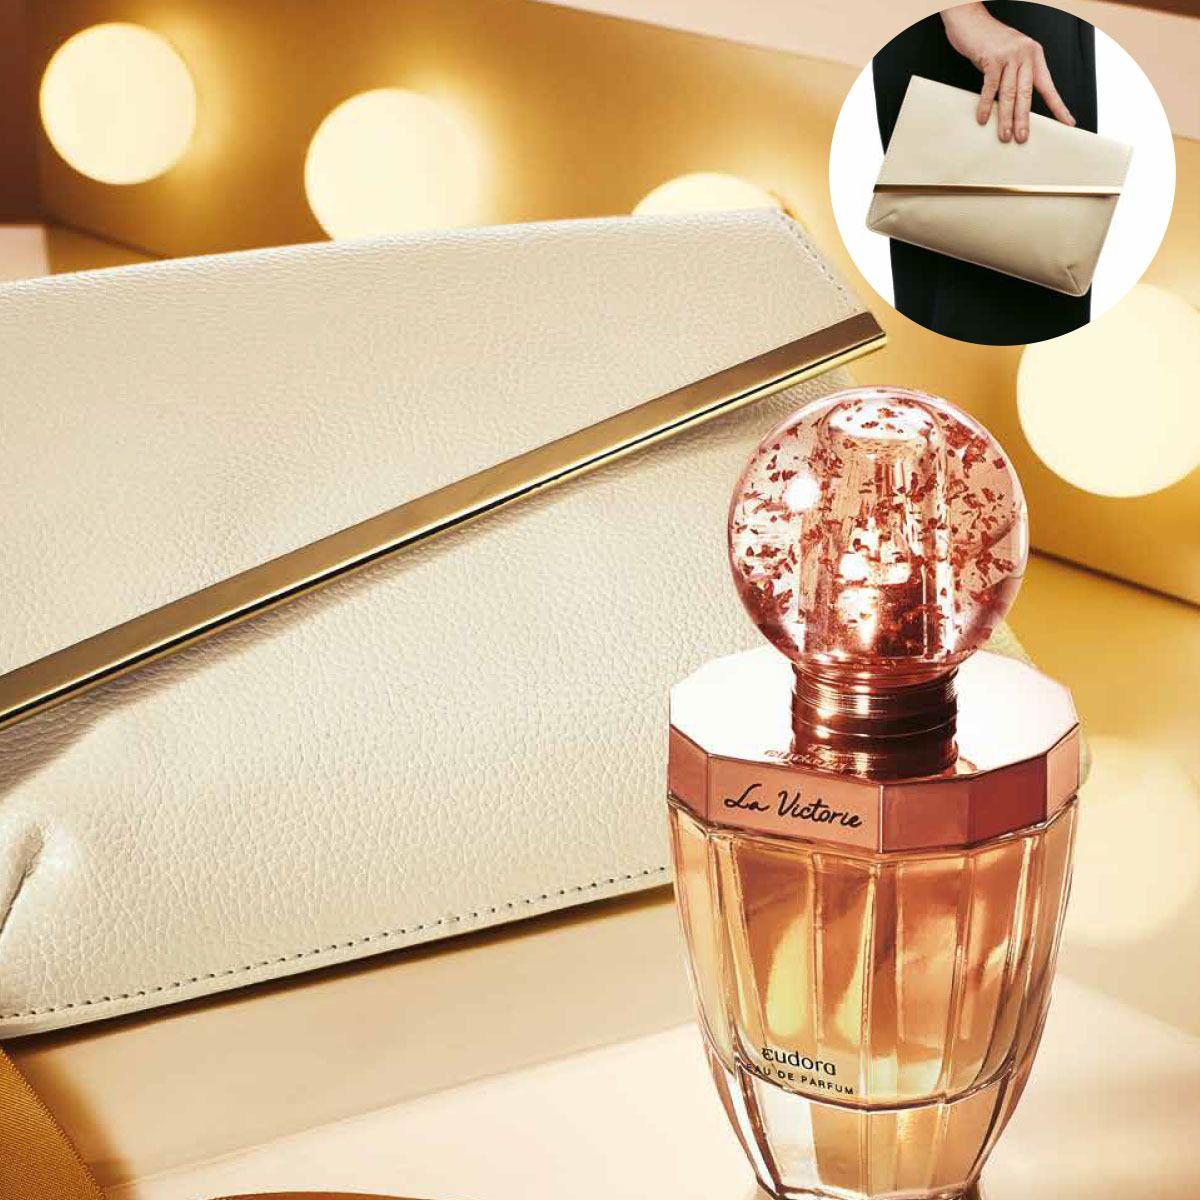 Estojo La Victorie: Eau de Parfum 75ml + Bolsa de Mão Clássica